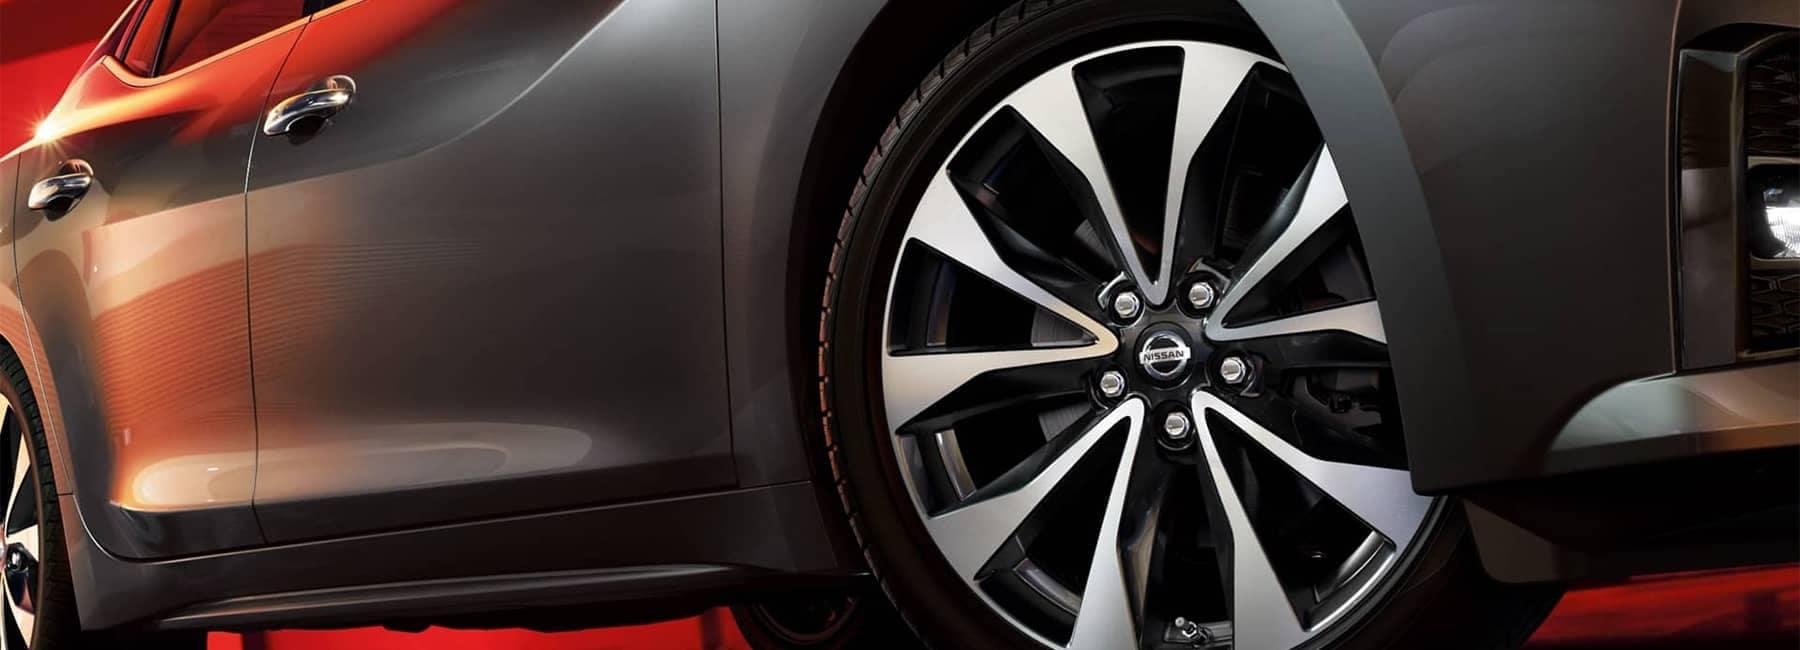 2020 Nissan Maxima Alloy Wheel